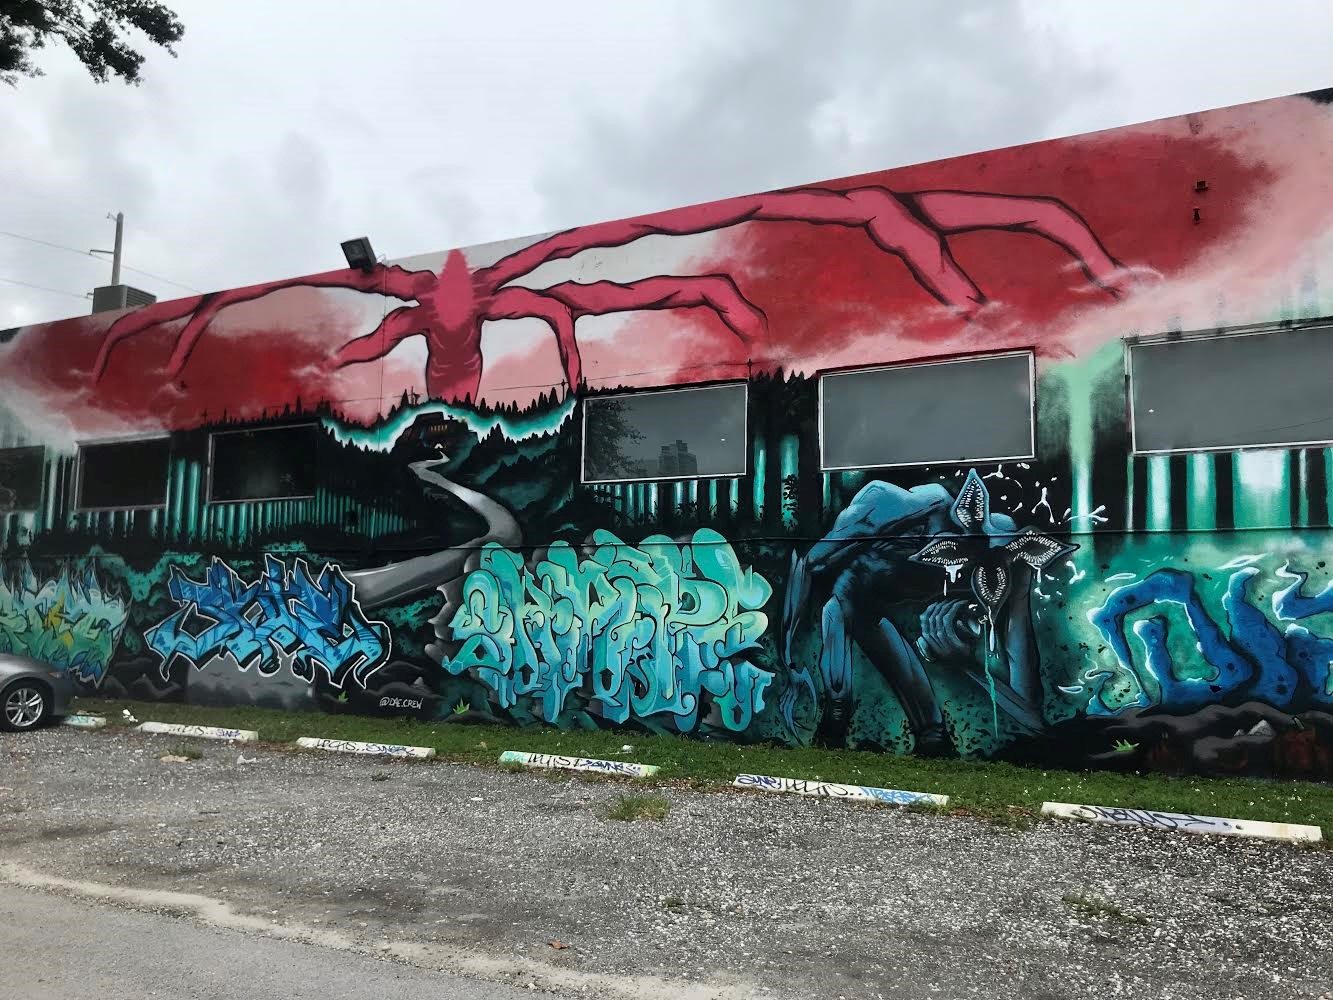 The Power of Graffiti by Julia Wood